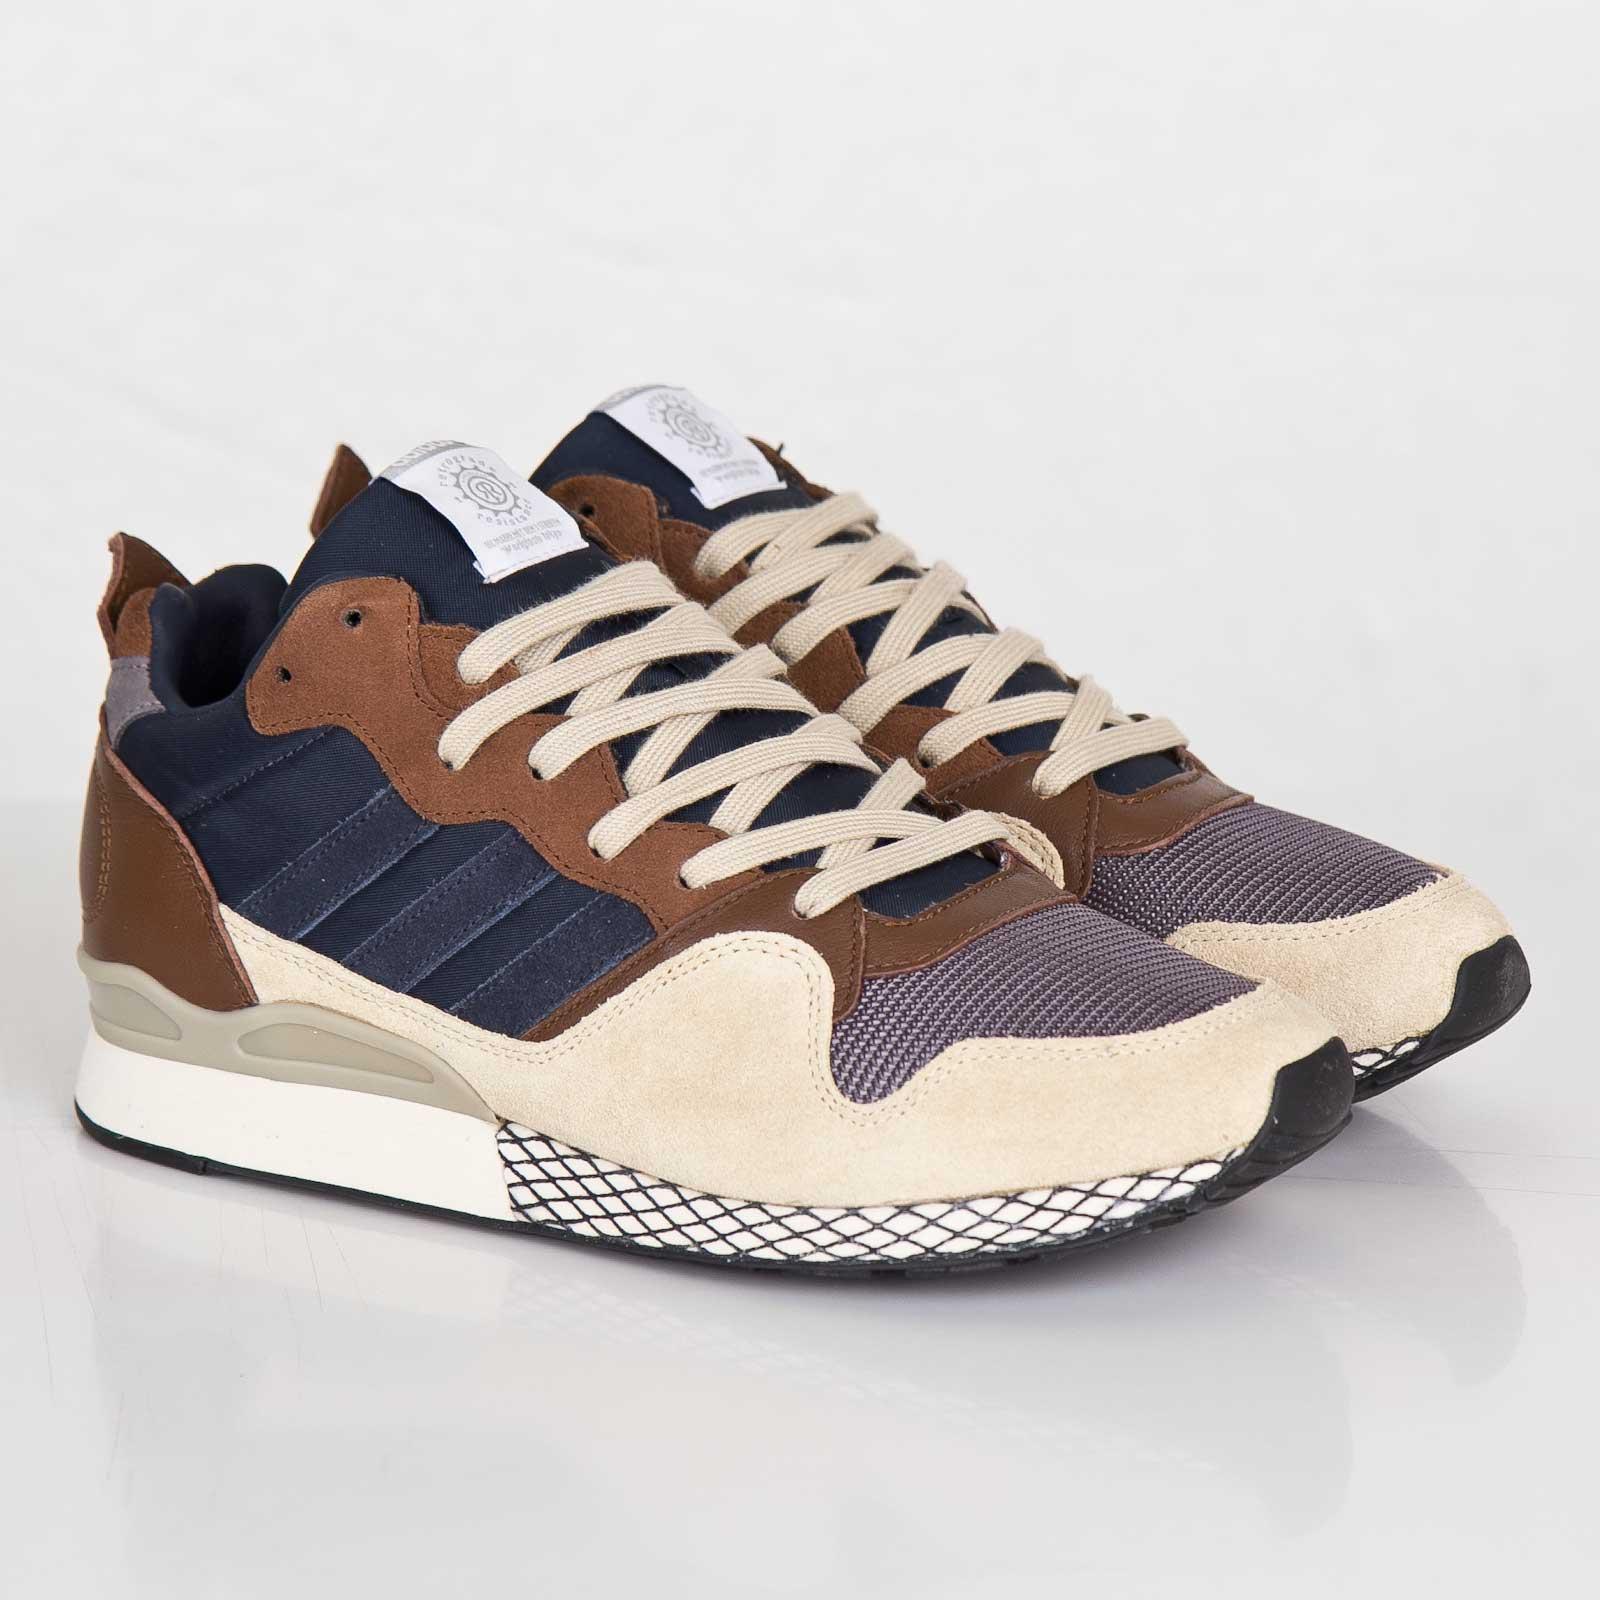 adidas ZXZ 930 84-Lab. - M25789 - Sneakersnstuff  8e3307c45adf